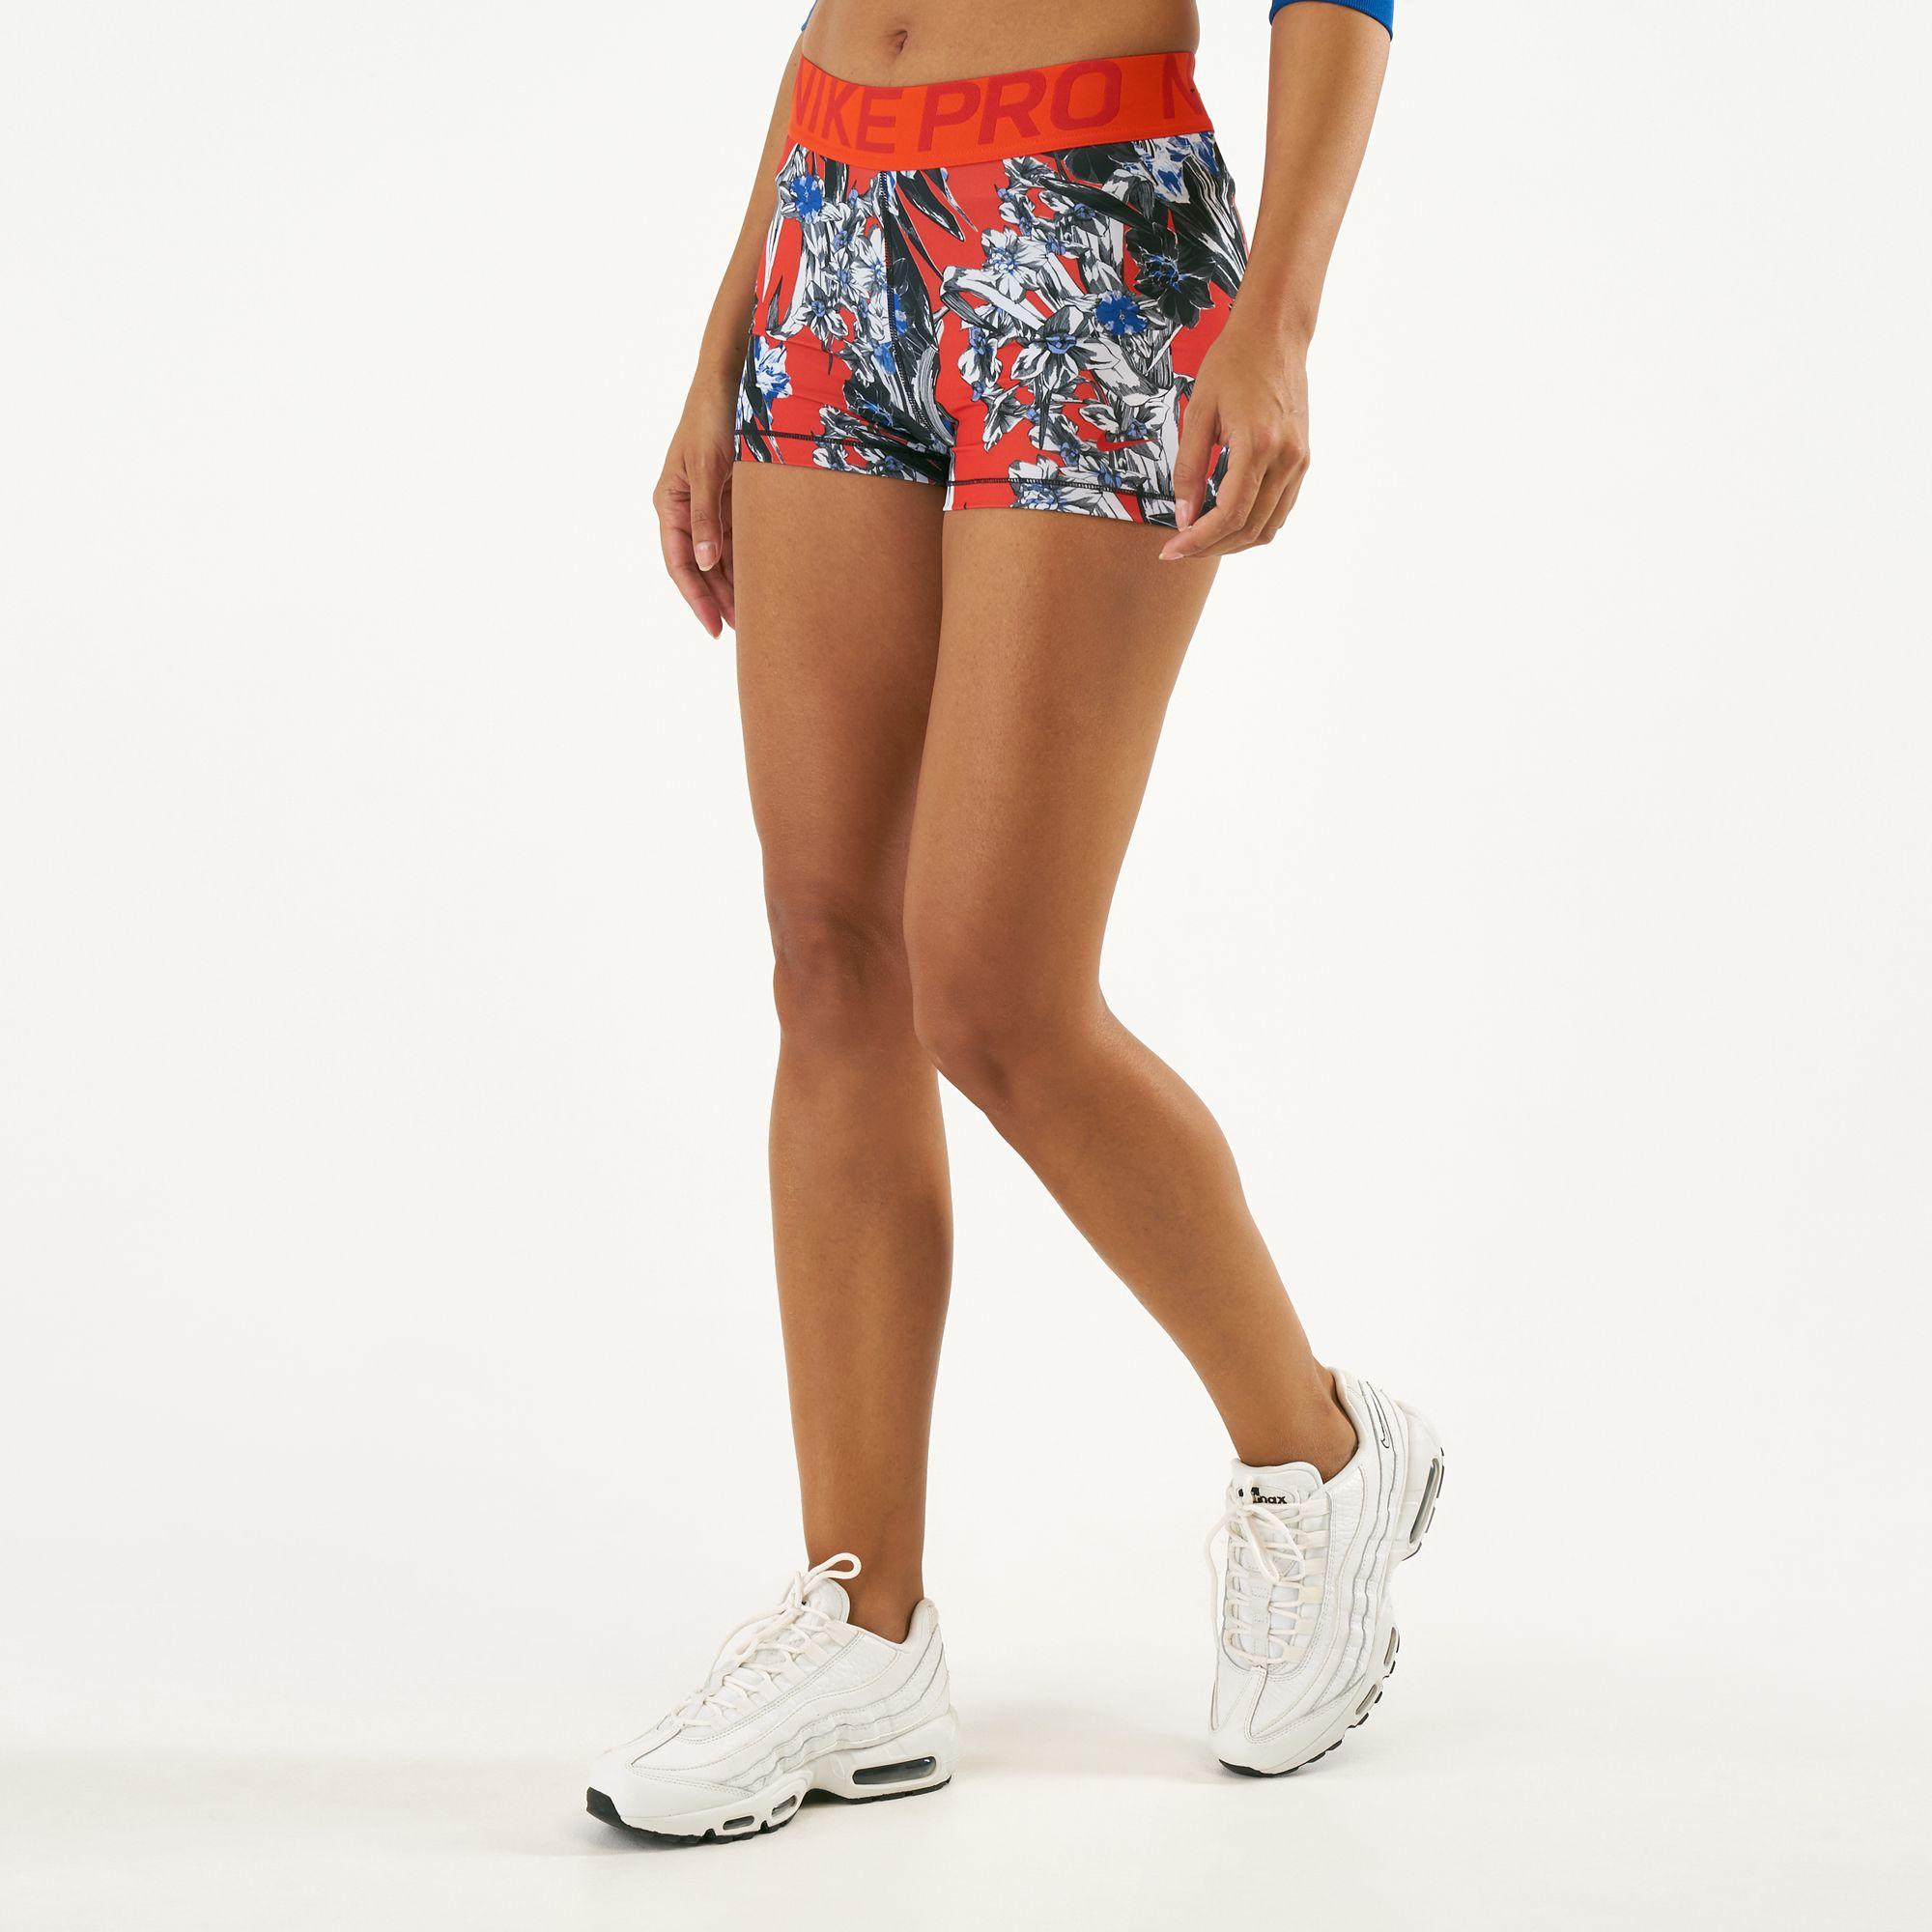 nike pro 8 inch shorts womens